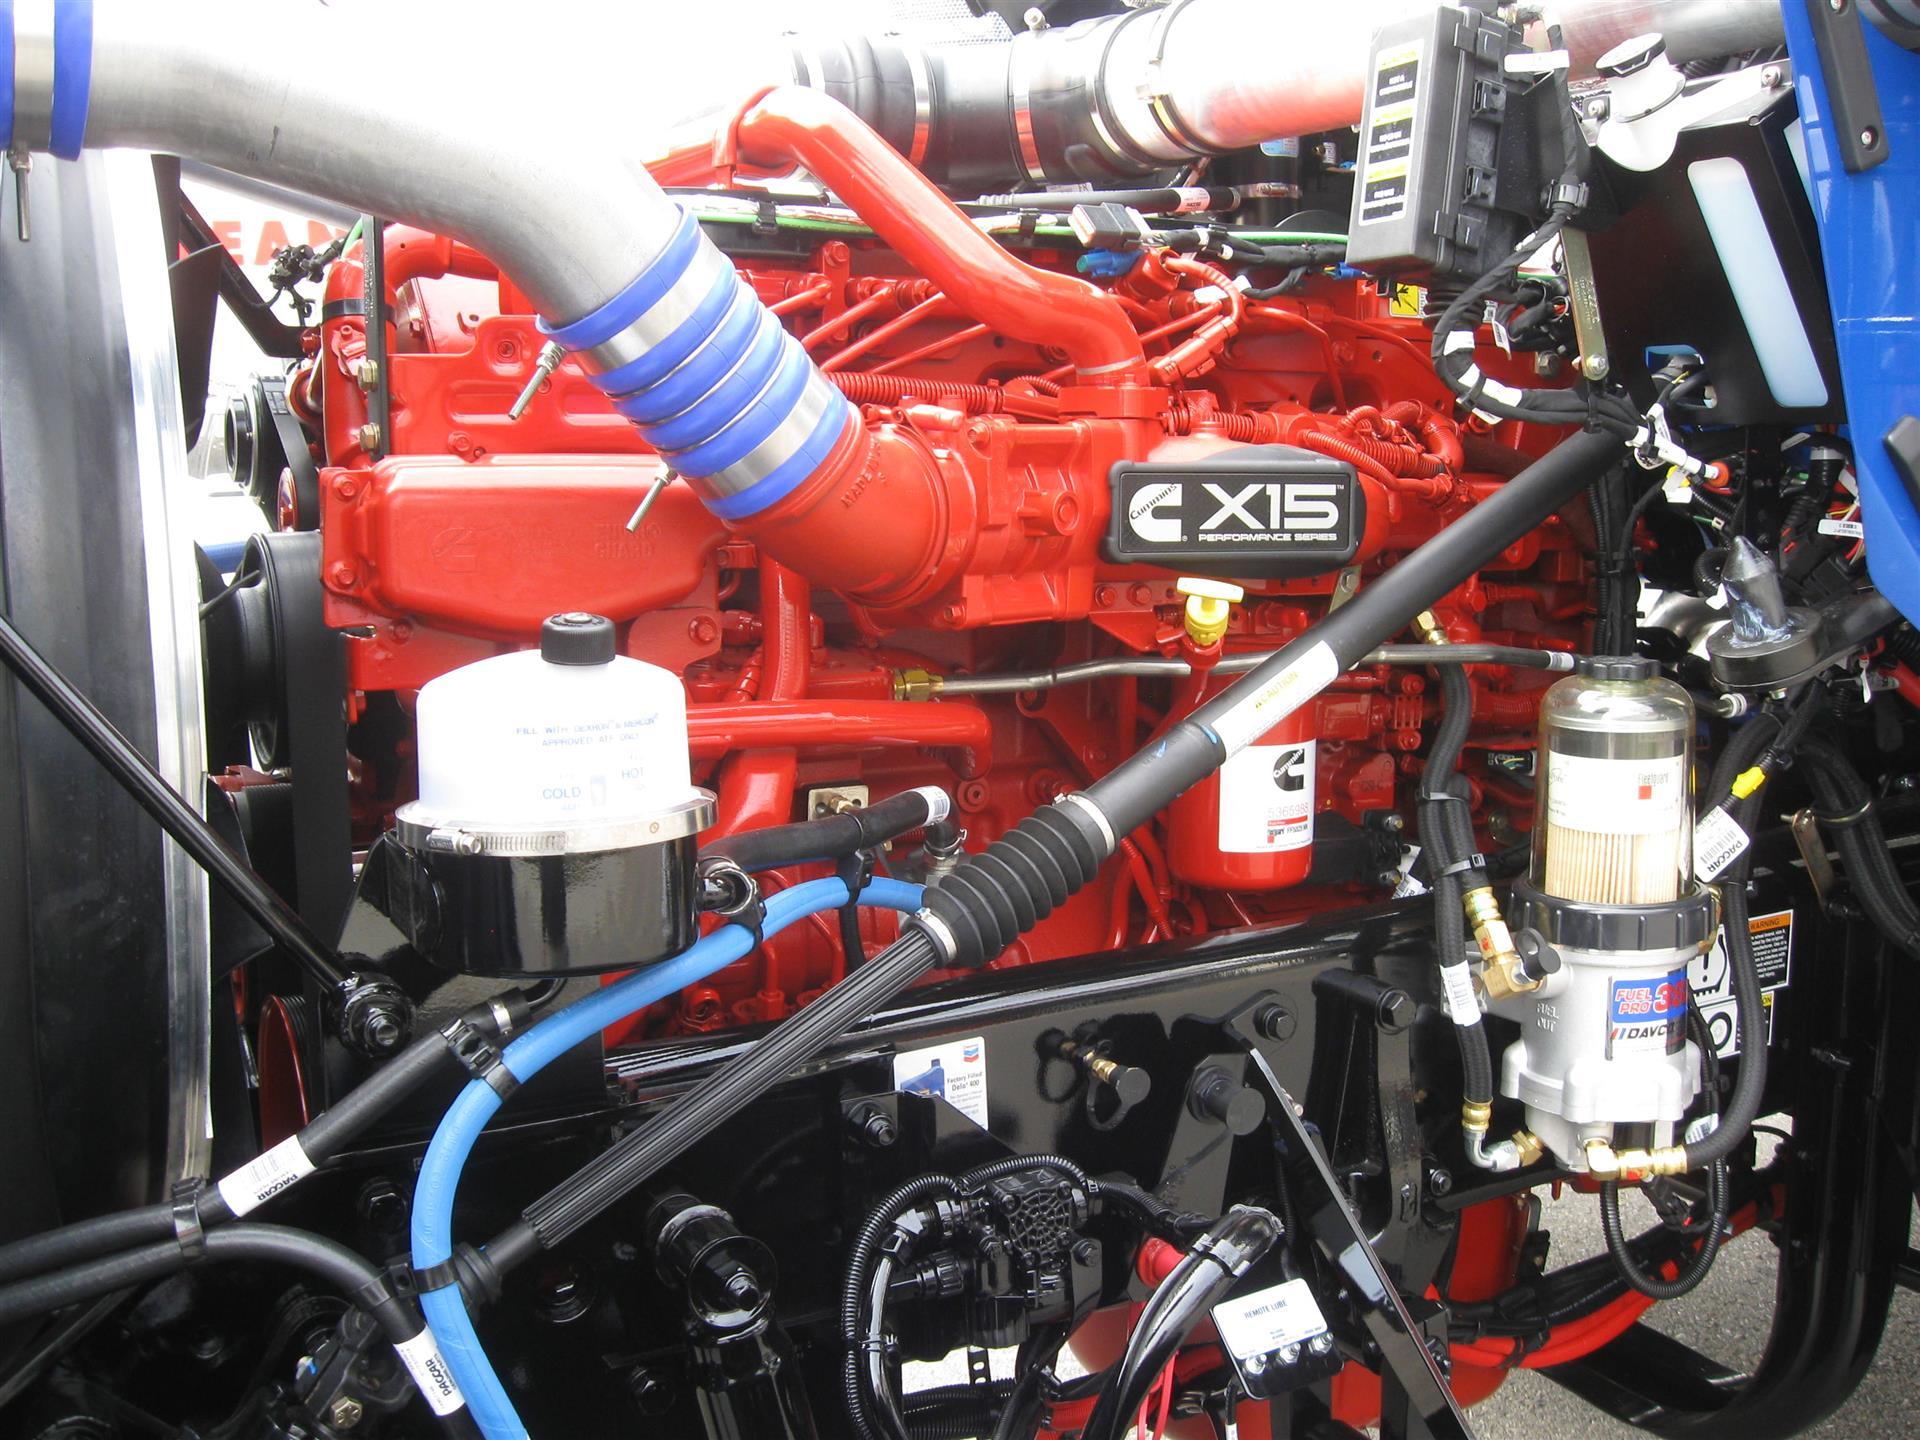 2019 Kenworth W900l Paccar Fuel Pump View Slideshow